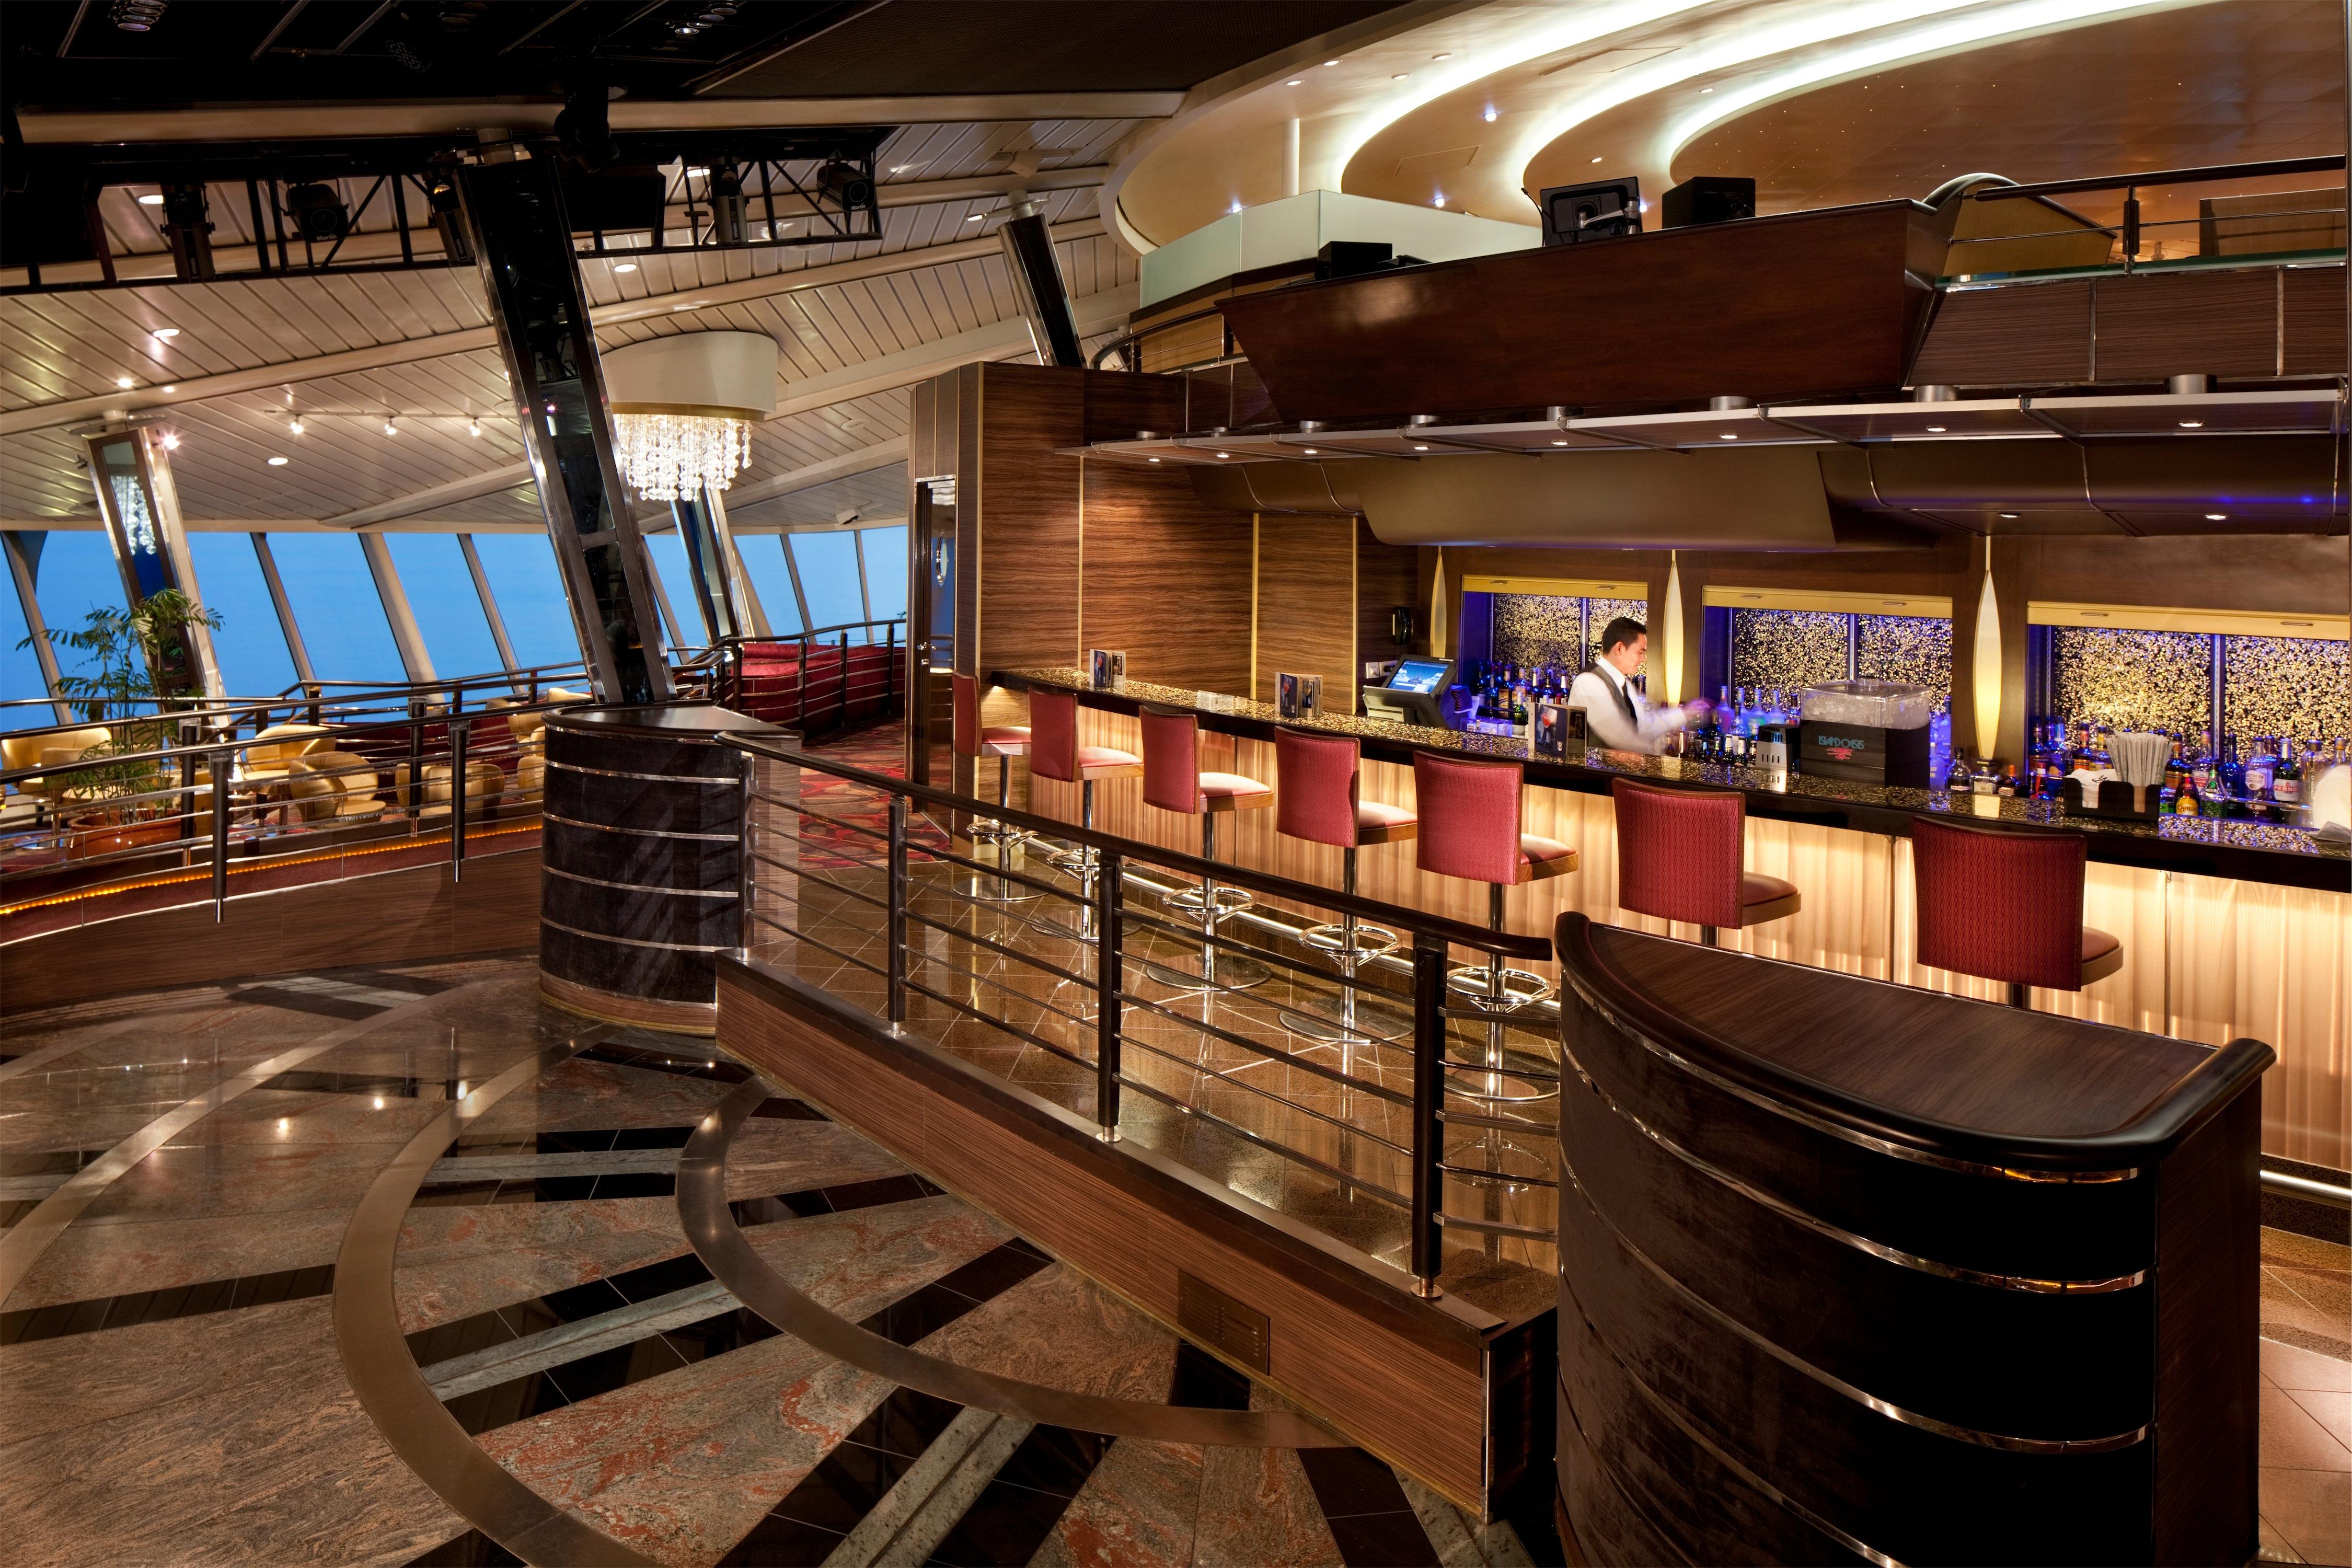 Royal Caribbean International Rhapsody of the Seas Interior Viking Crown.jpg